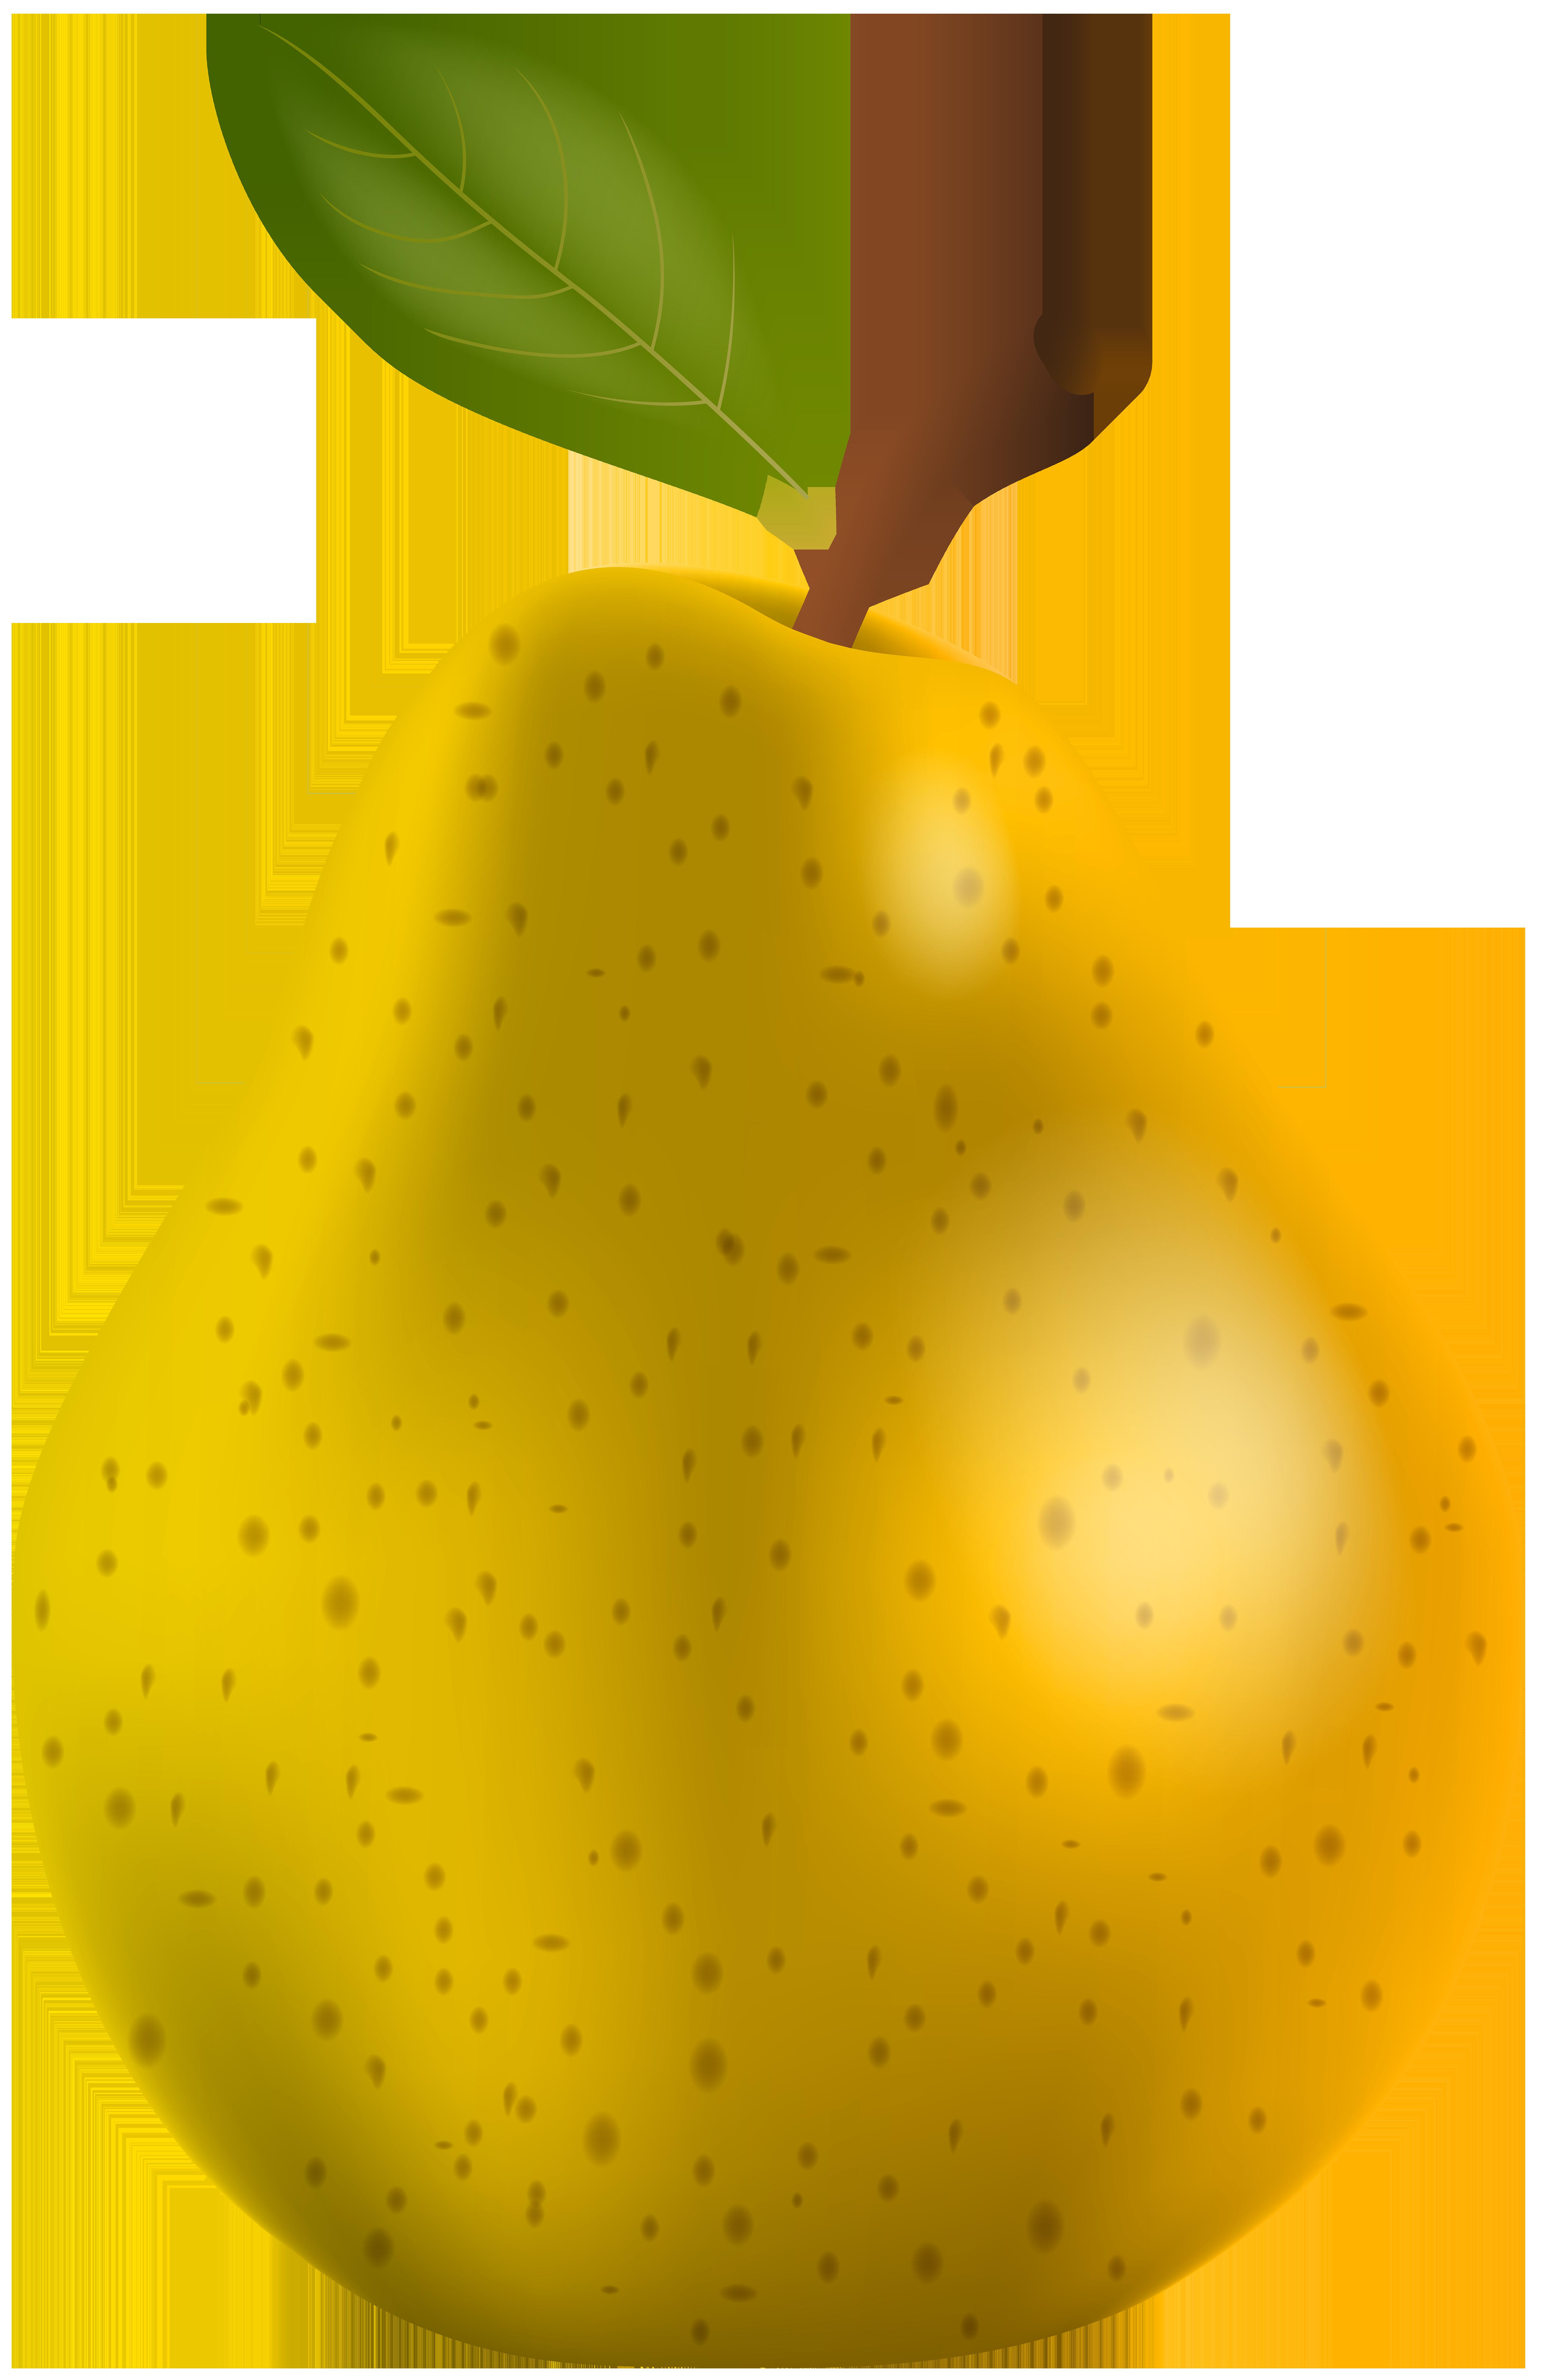 Pear clipart different kind fruit. Transparent png clip art